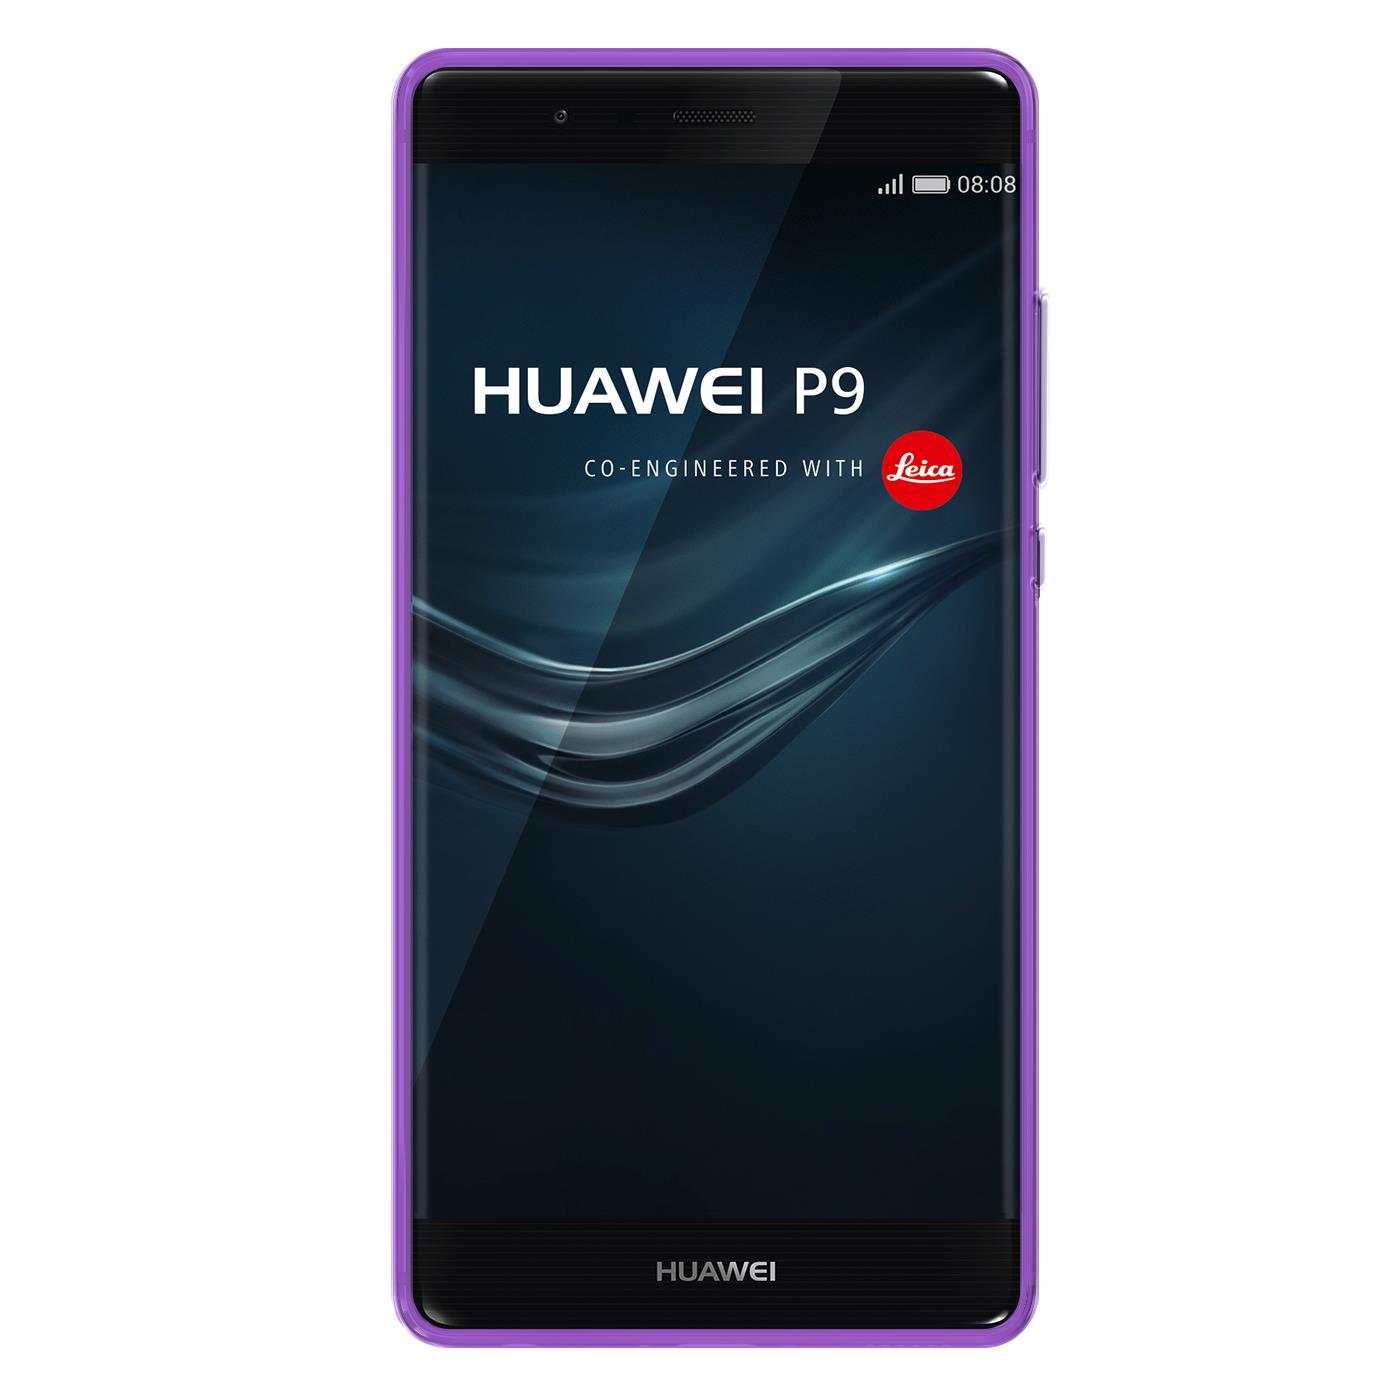 Huawei-p9-Duenn-Silikon-Klar-Case-Cover-Ultra-Slim-Stossfeste-Gel-Rueckseite Indexbild 21